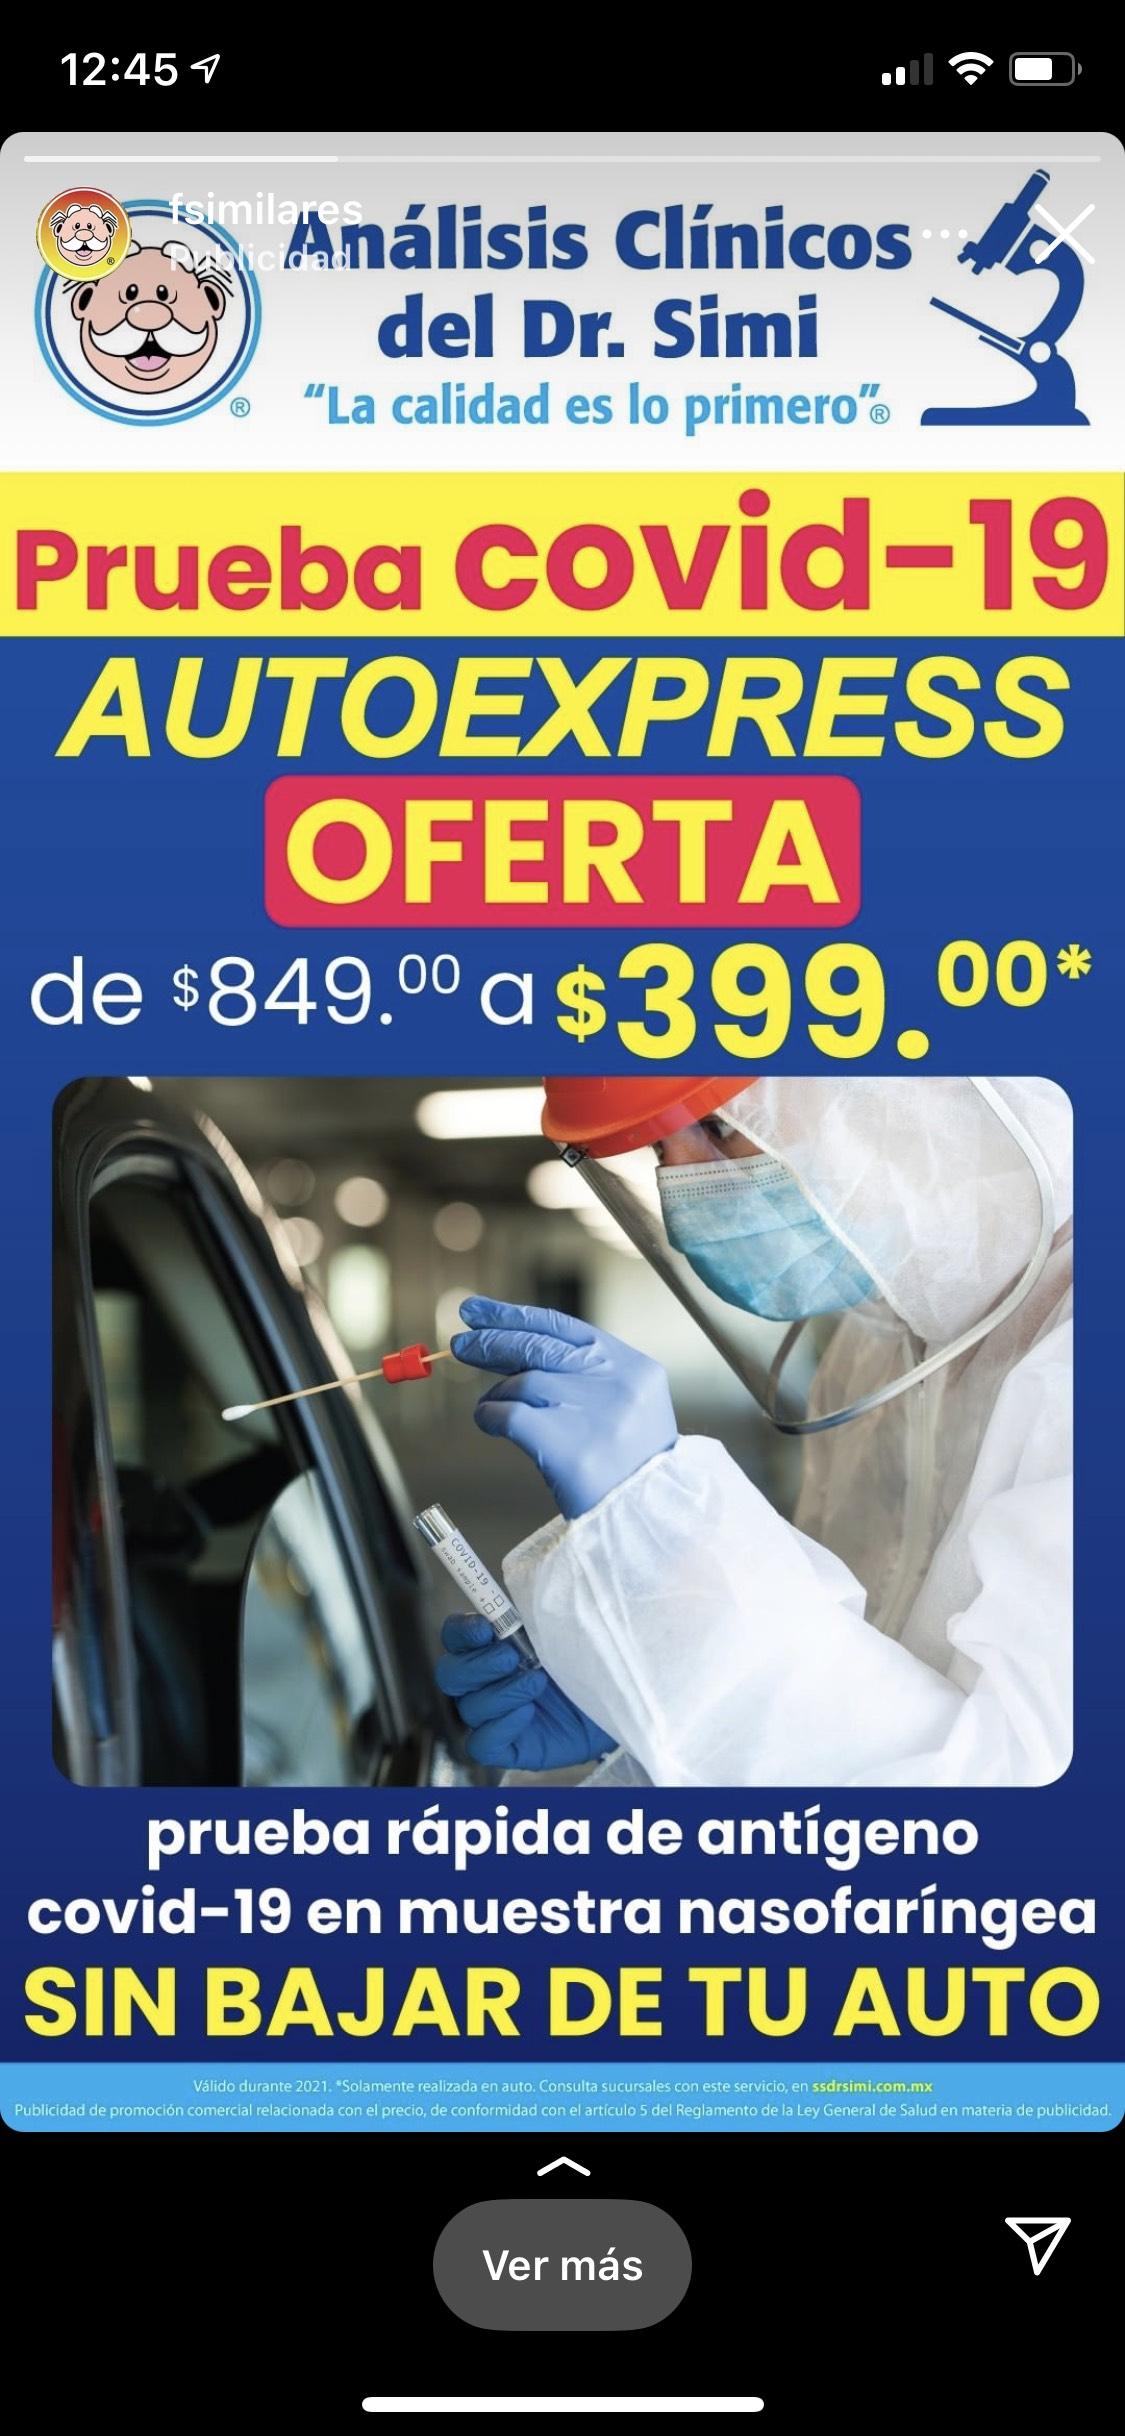 Dr. Simi: Prueba COVID 19 Autoexpress